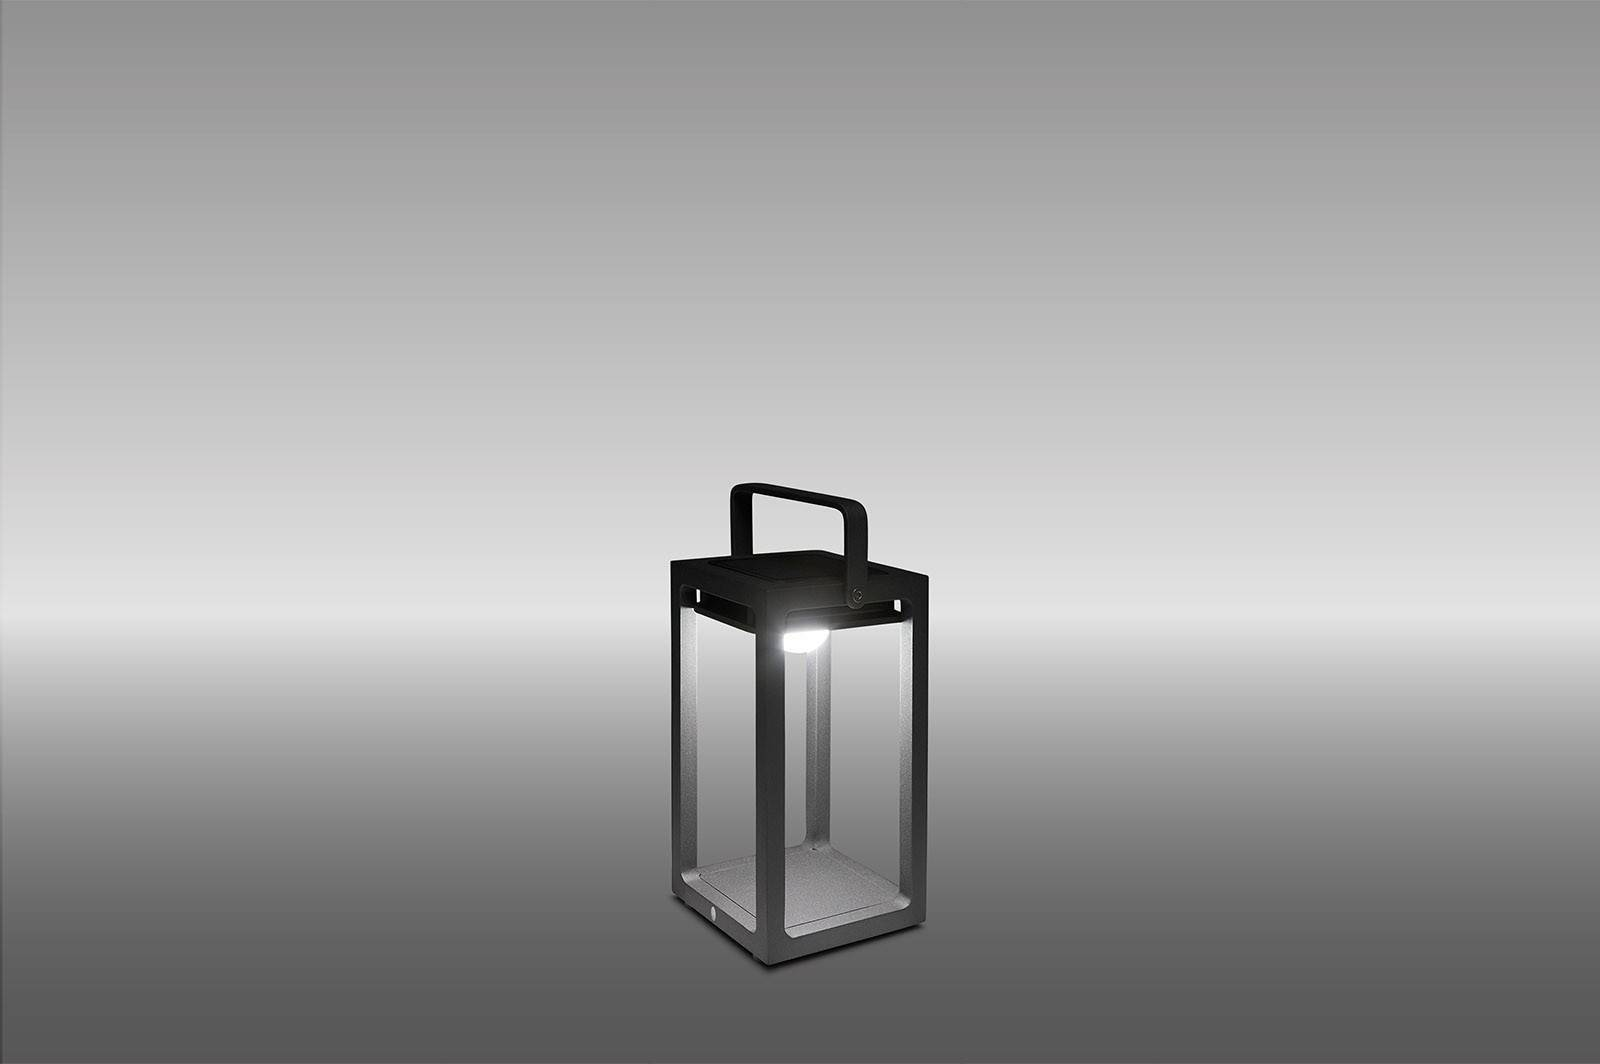 SOLÁRNÍ LAMPA JACK ROYAL GREY 14X14X26 CM